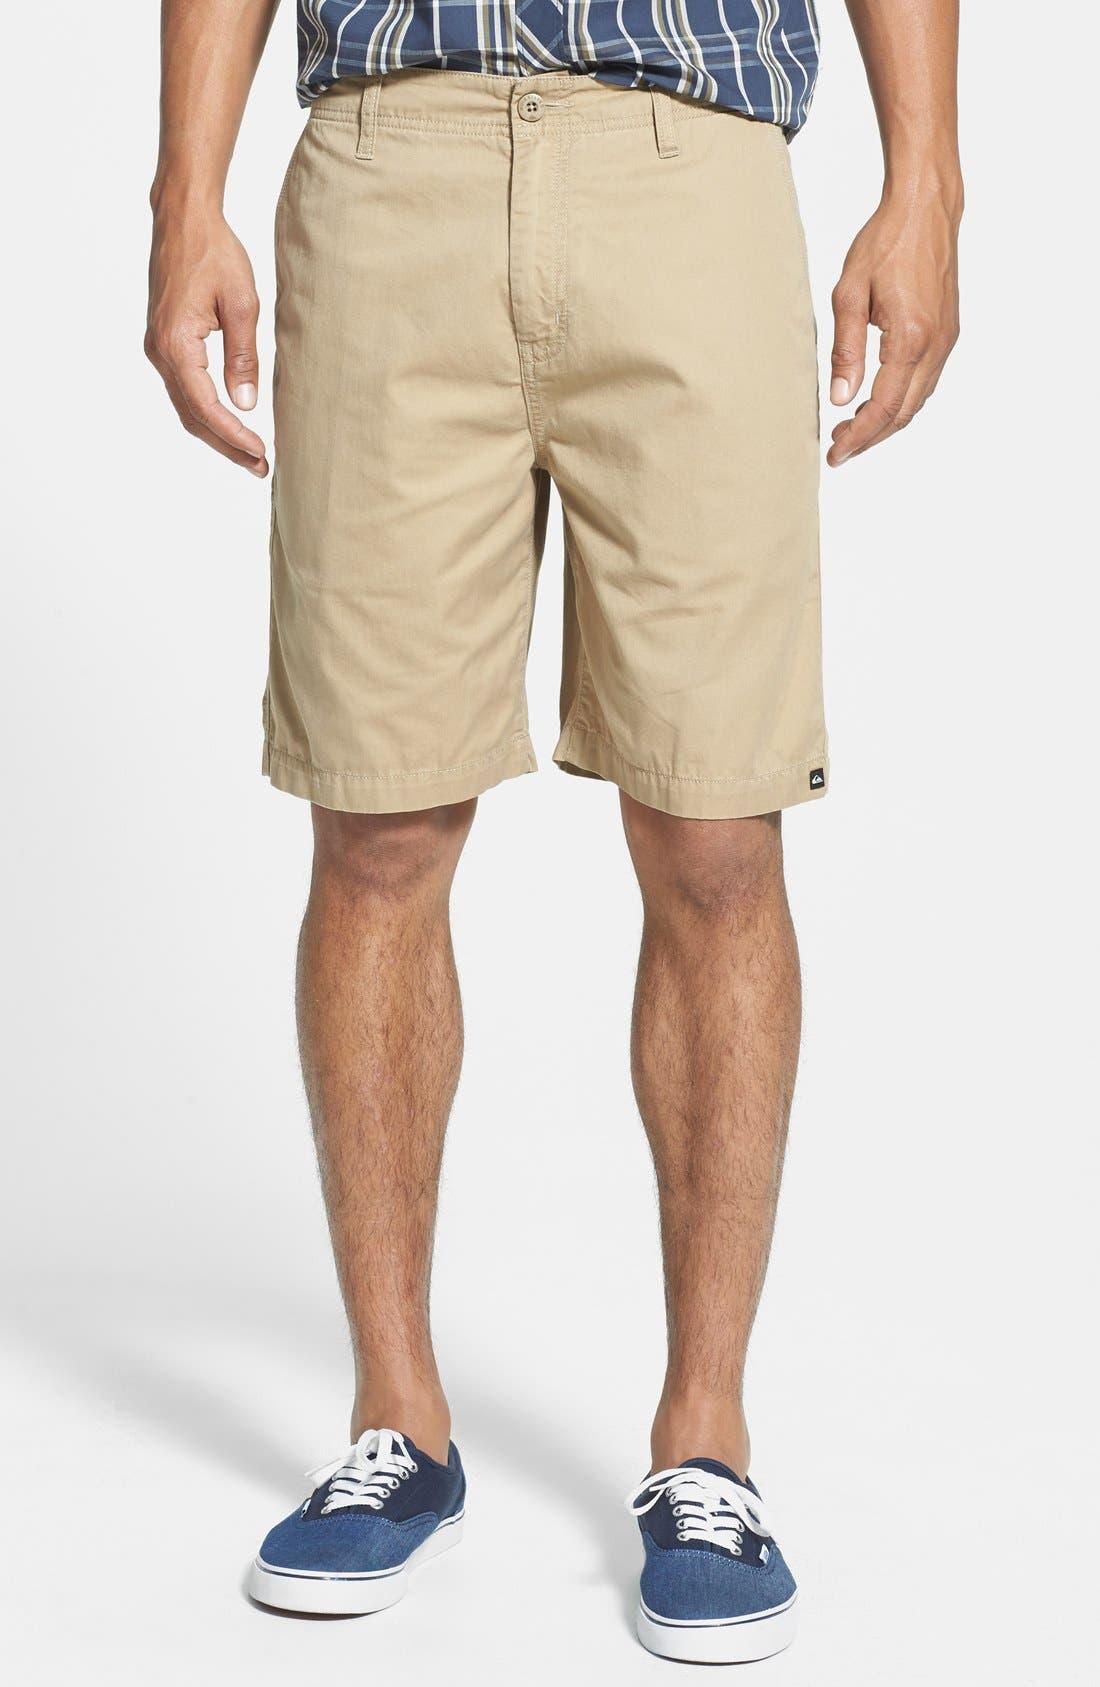 Main Image - Quiksilver 'Minor Road' Shorts